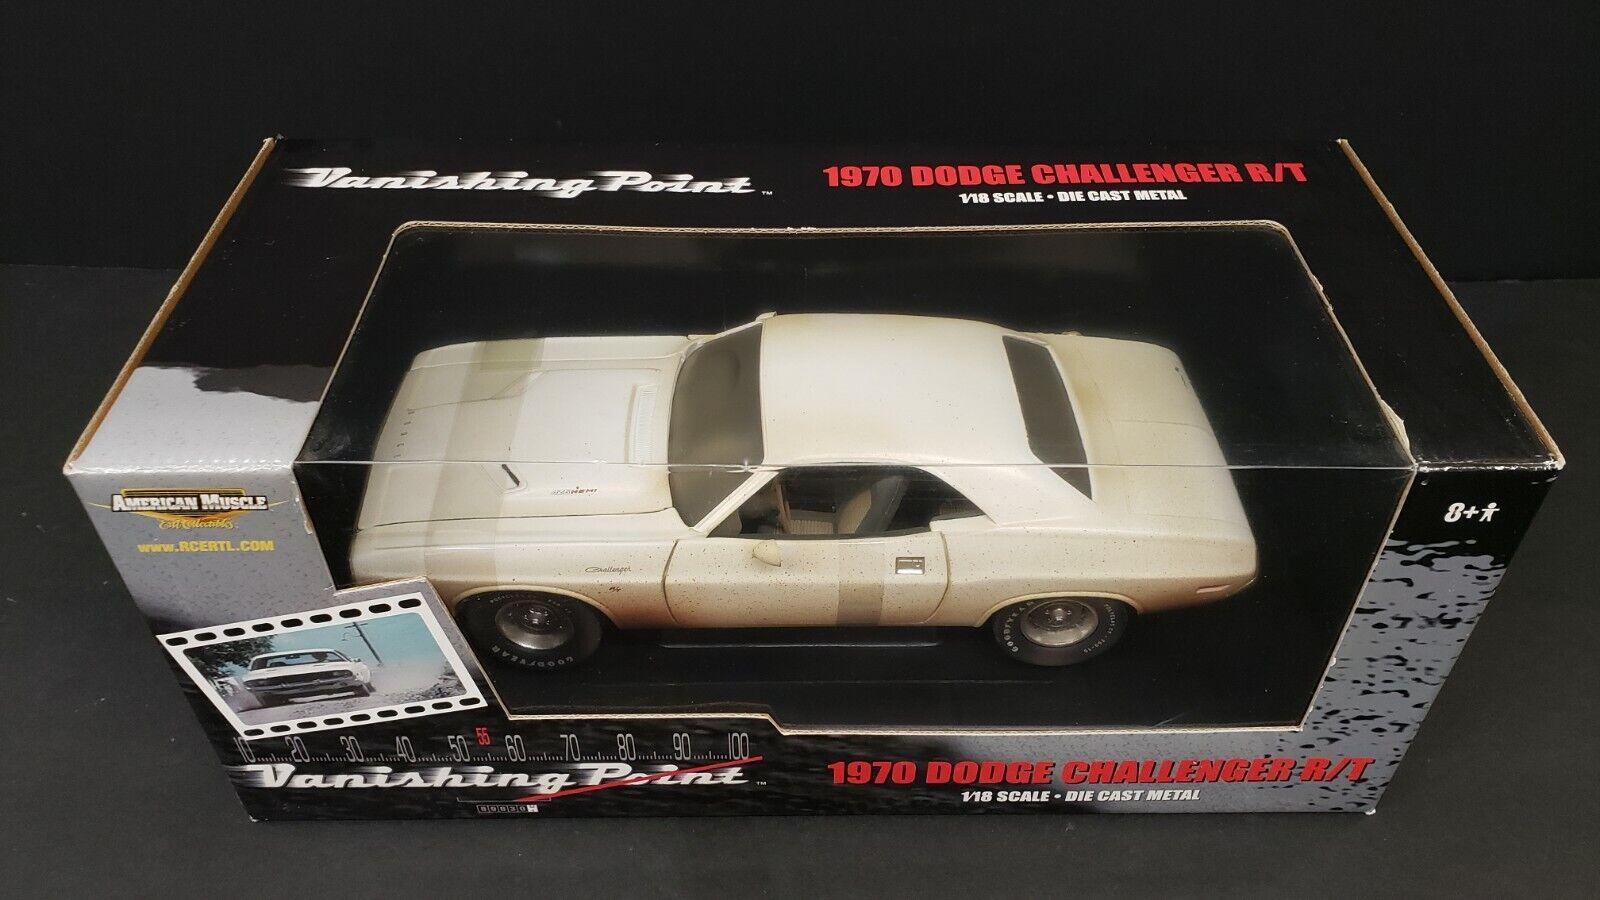 1970 DODGE CHALLENGER VANISHING POINT DIRTY VERSION 1 18